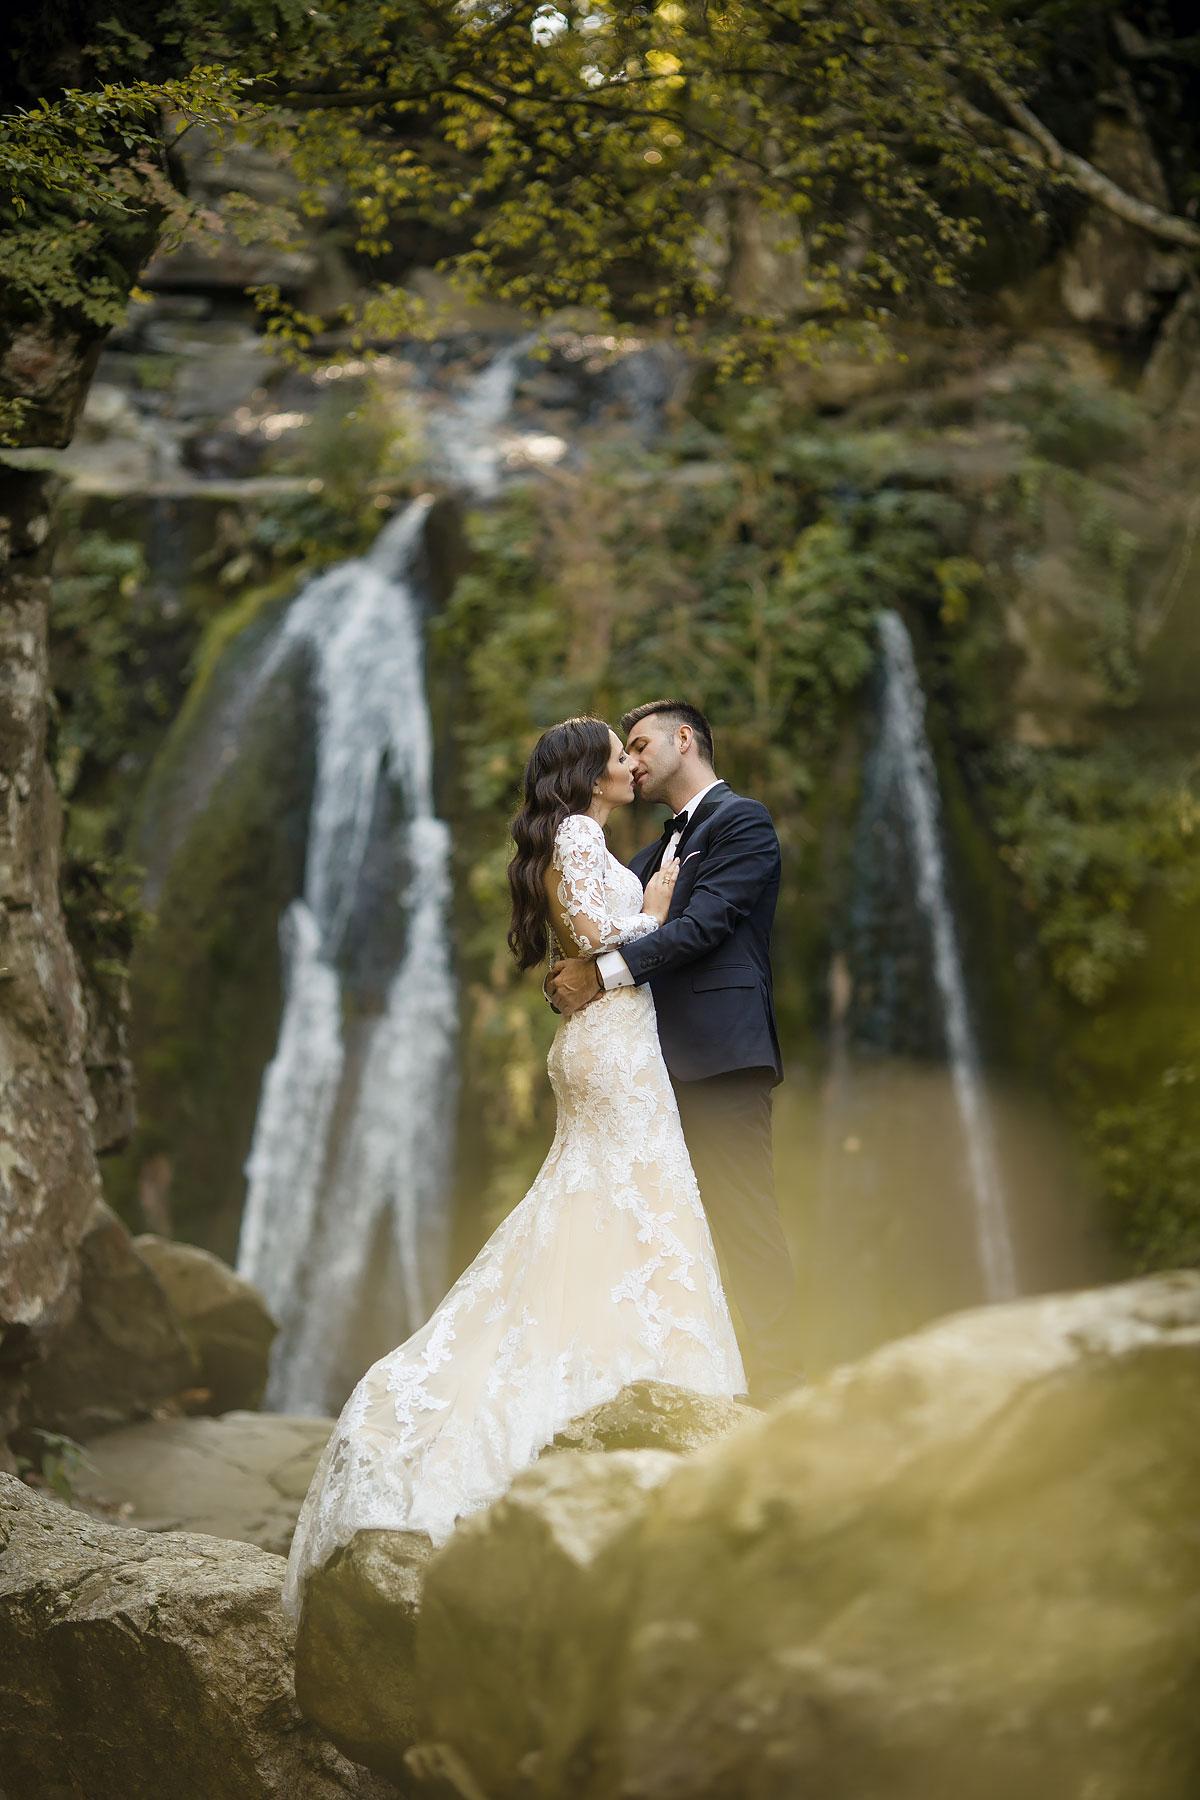 2f4fp2_wedding_dimitris_ioanna_1522.jpg